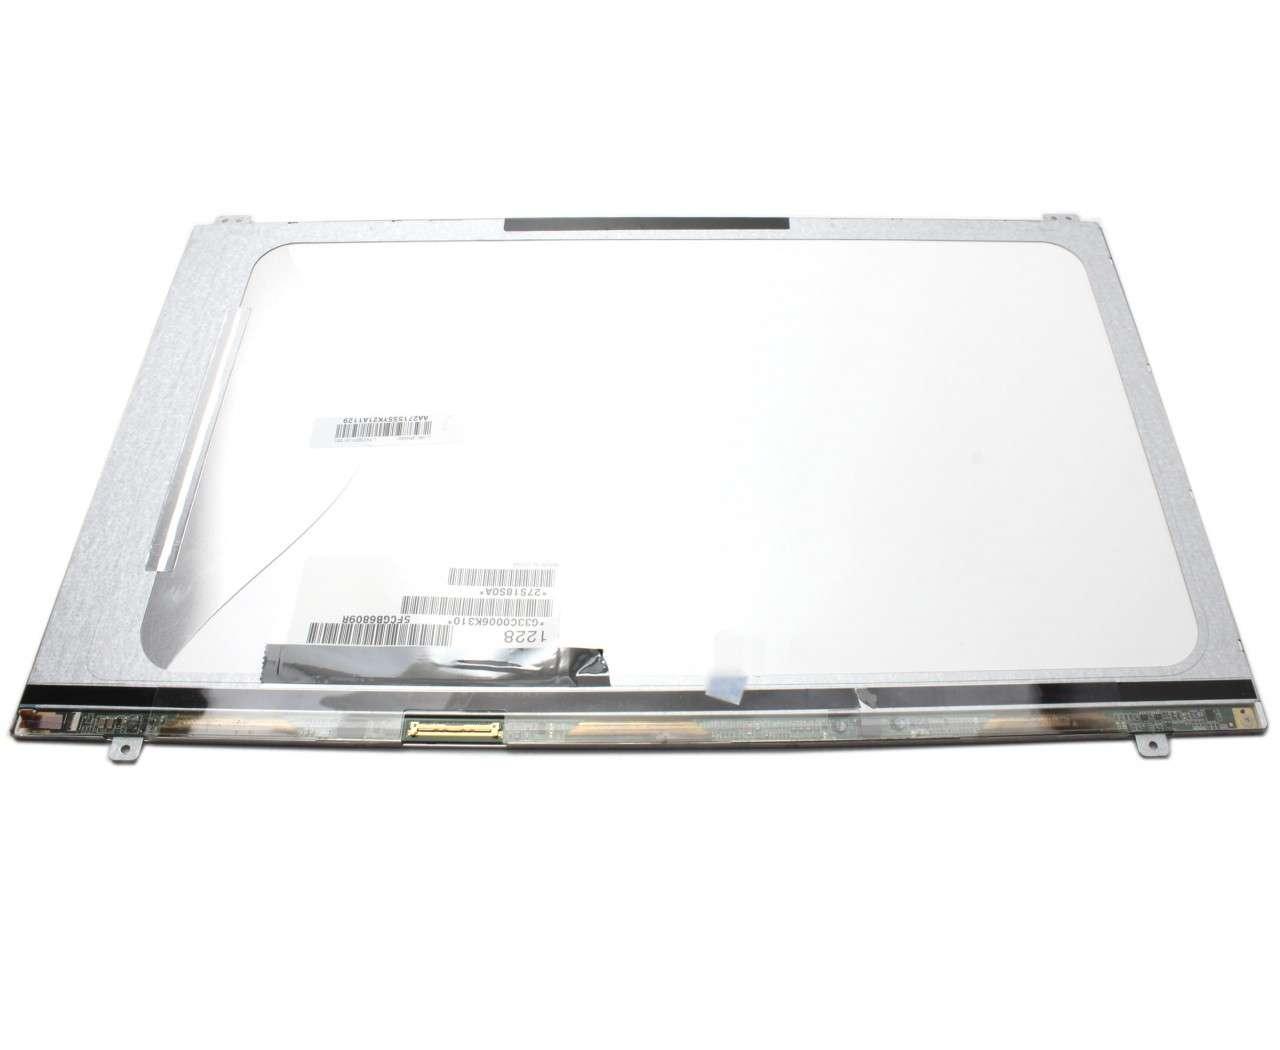 Display laptop Samsung LTN156AT19-803 Ecran 15.6 1366X768 40 pini LVDS imagine powerlaptop.ro 2021